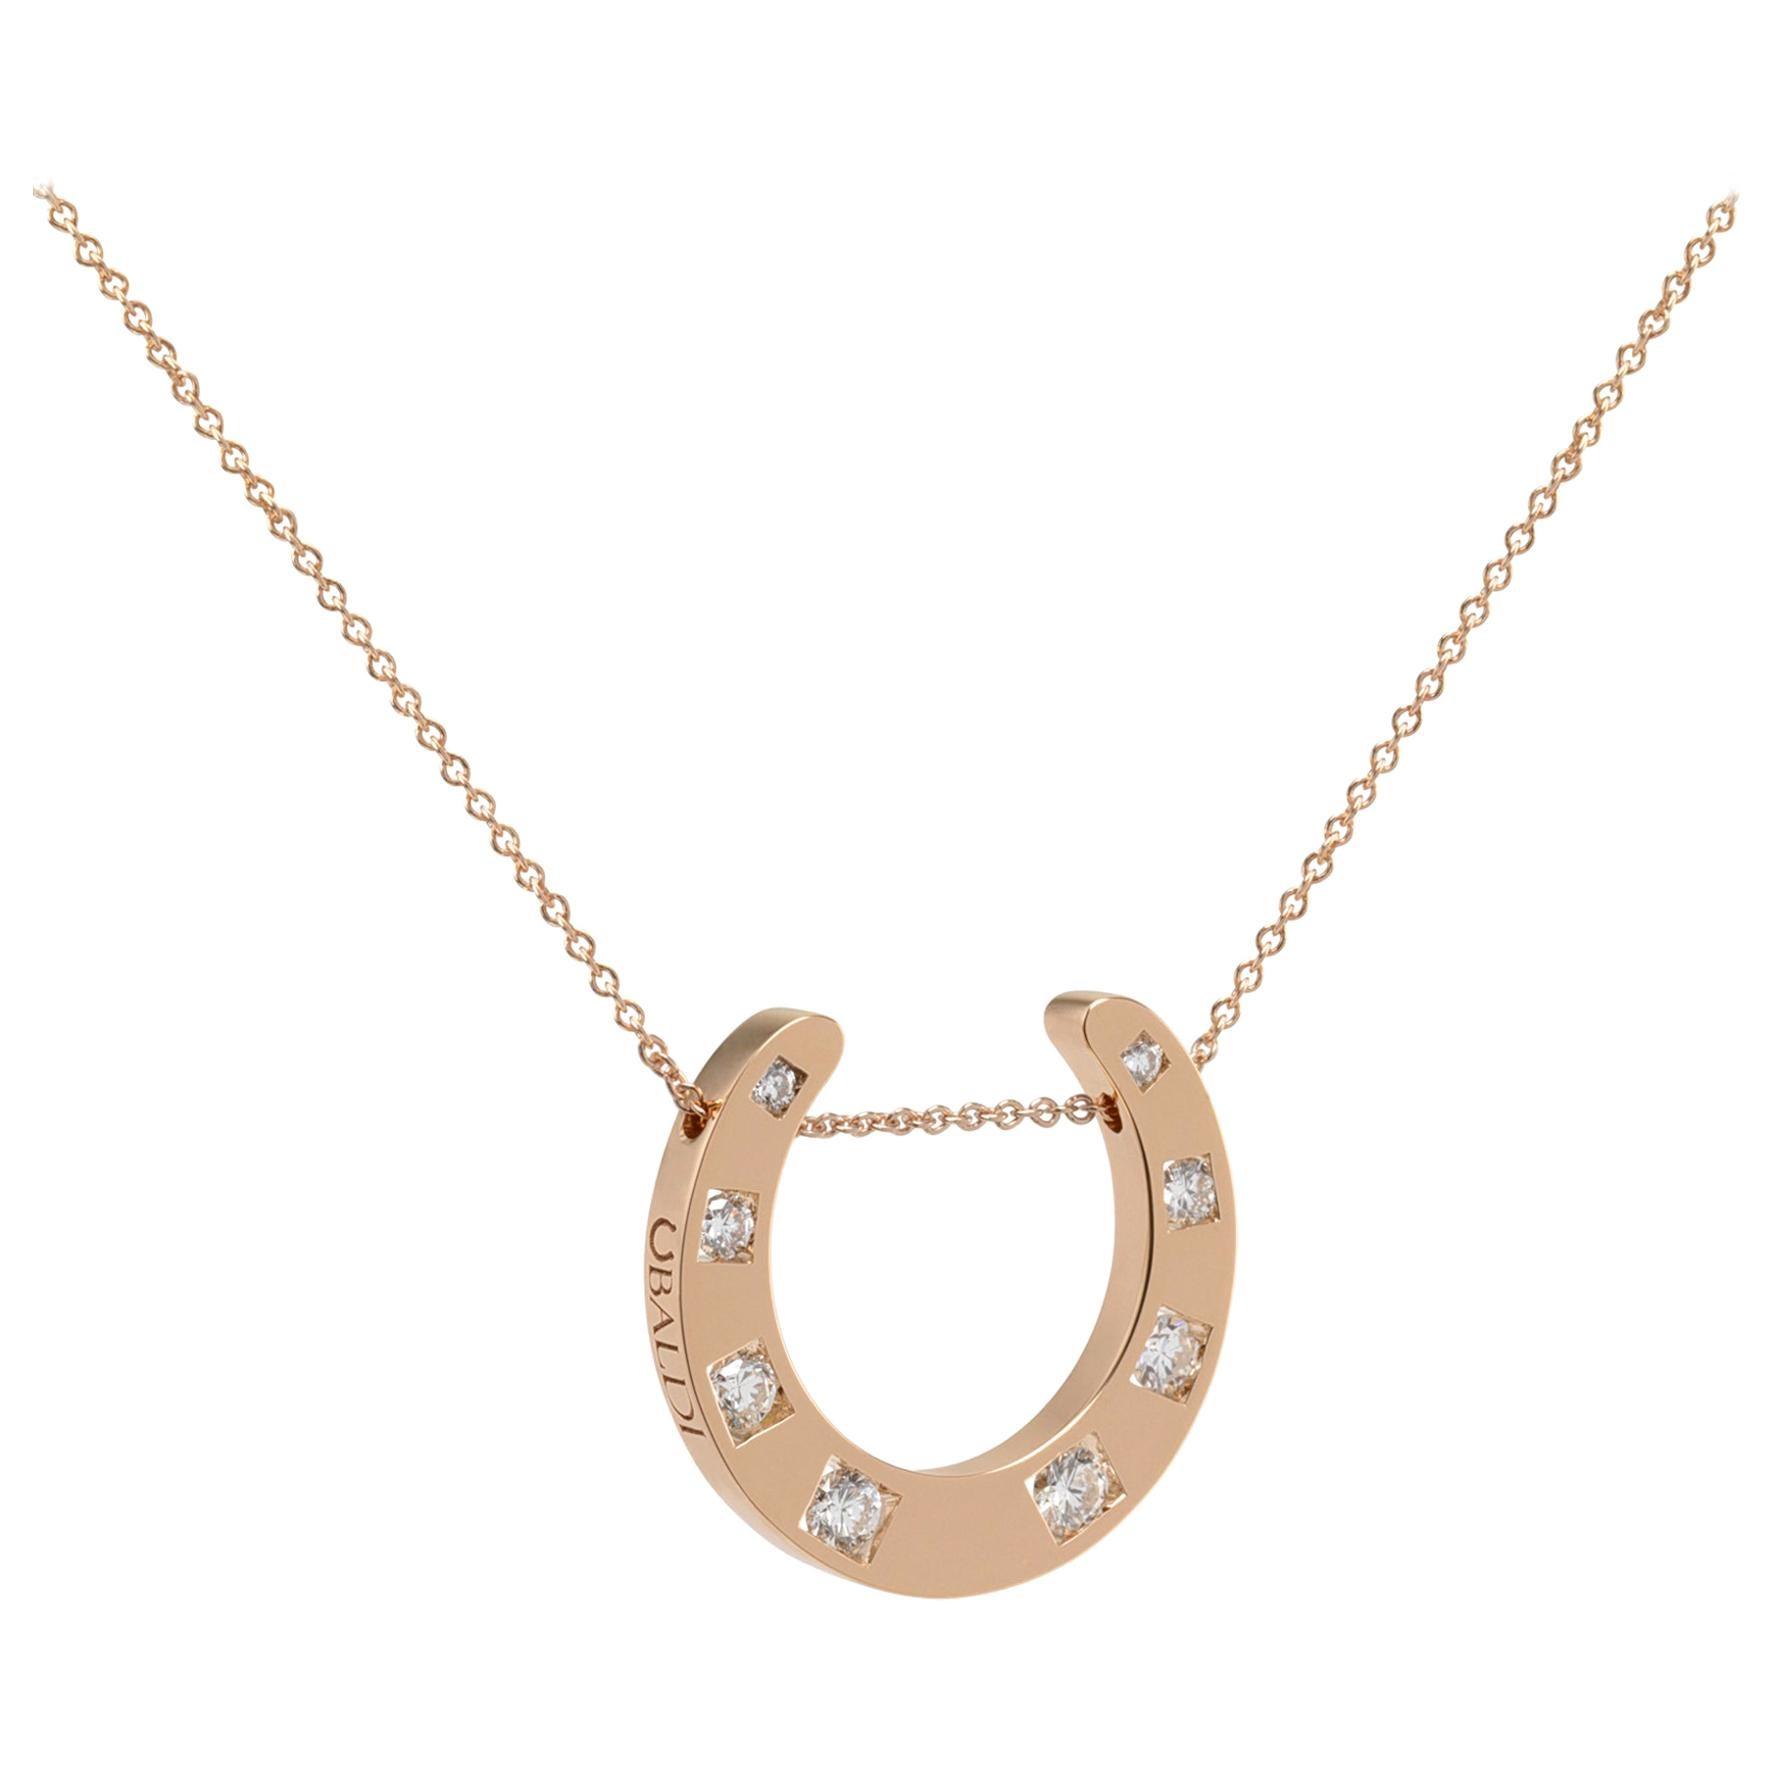 Ubaldi Gioielli 18kt Gold Equestrian Horseshoe Necklace Pendant Eight Diamonds